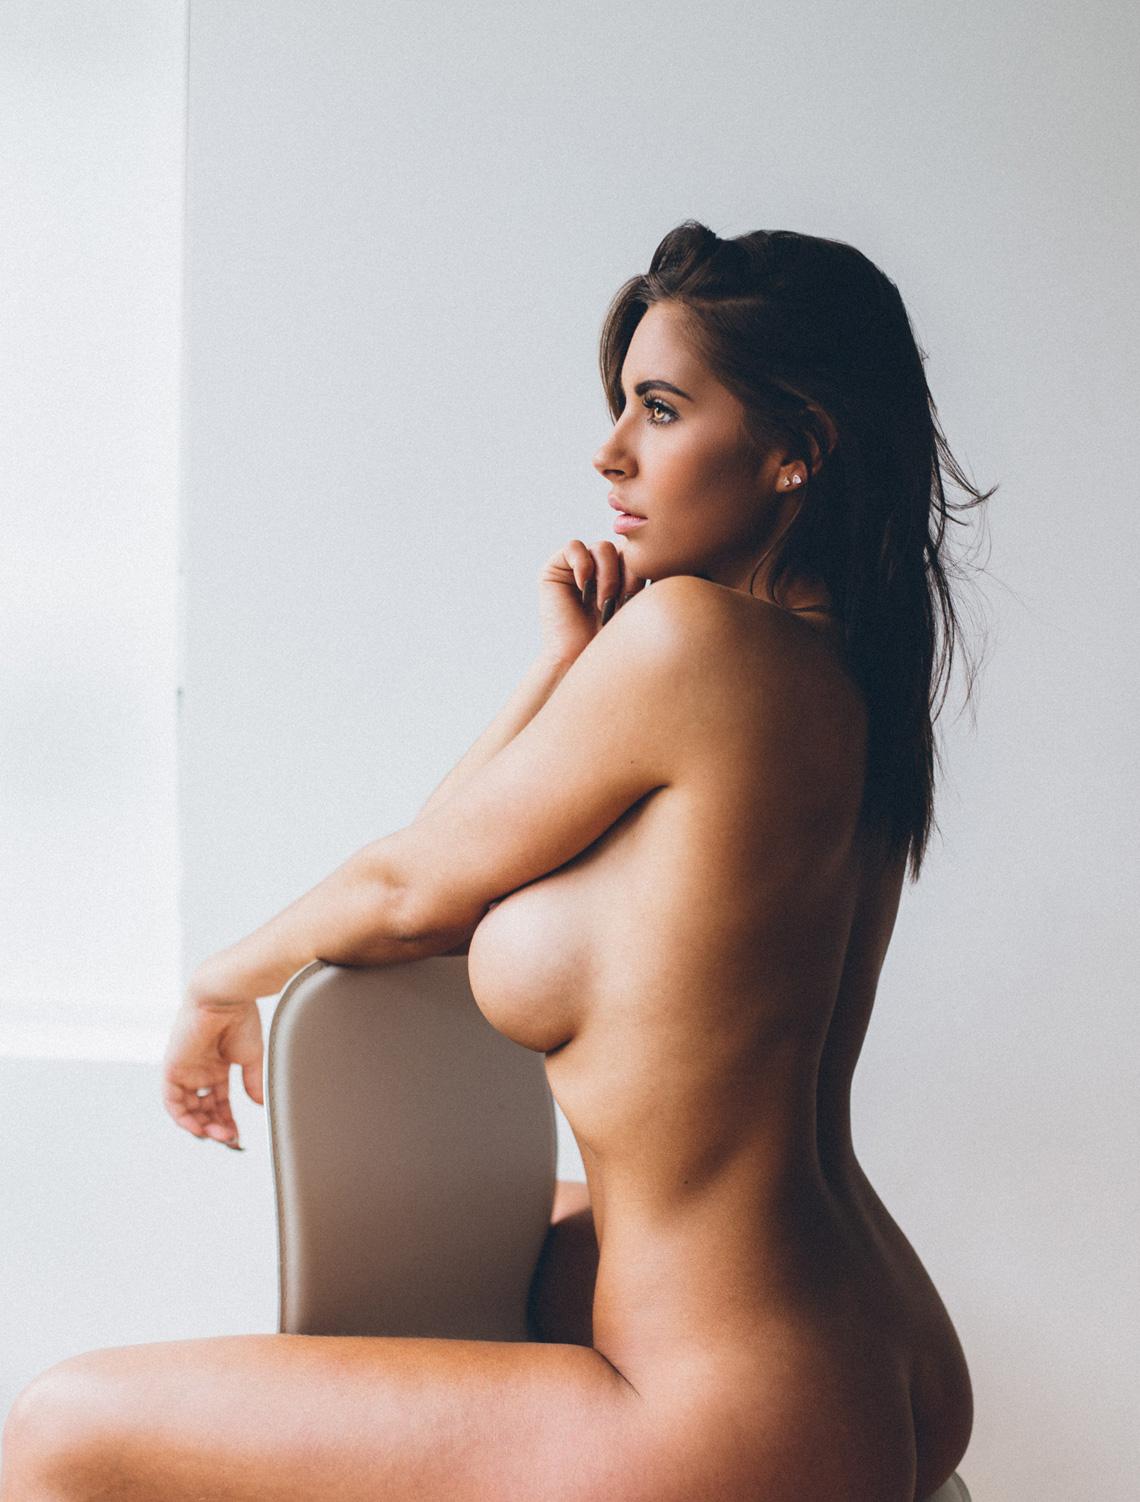 Leaked josie nude loren